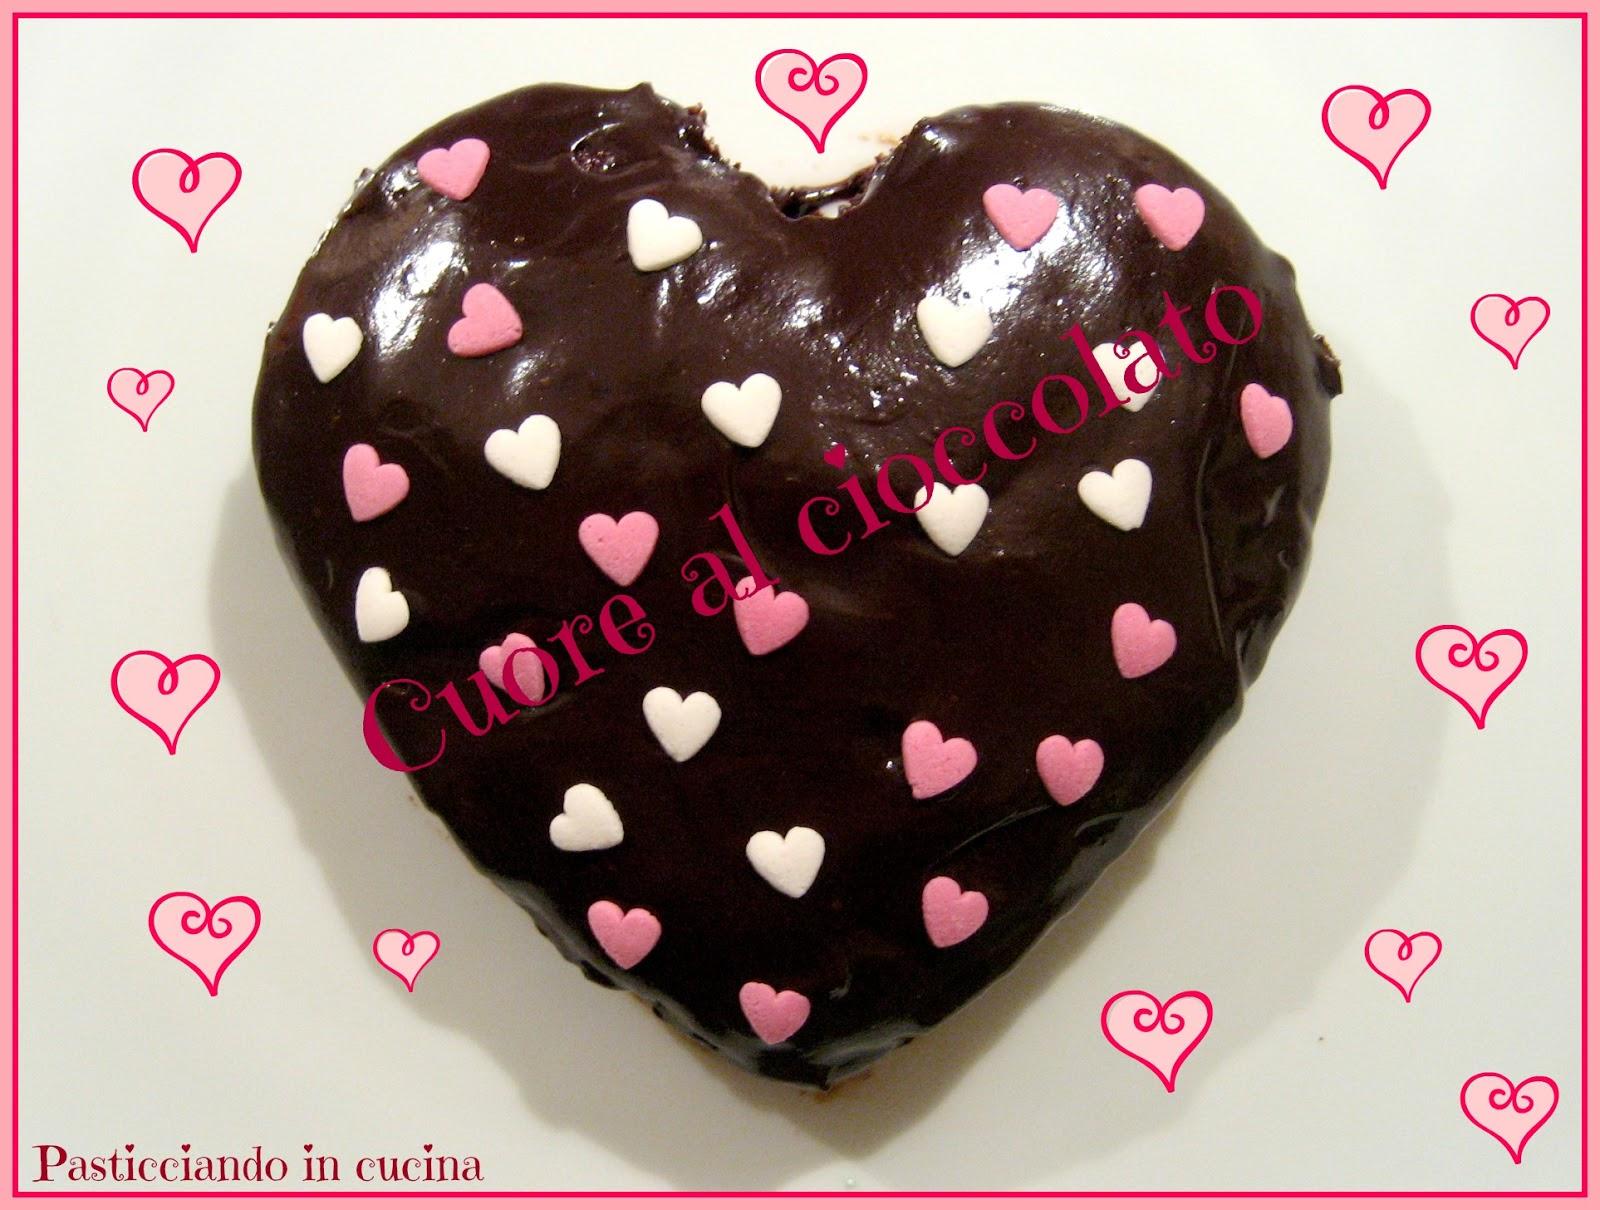 Torta a forma di cuore ricetta semplice ll97 regardsdefemmes for Isola cucina a forma di torta